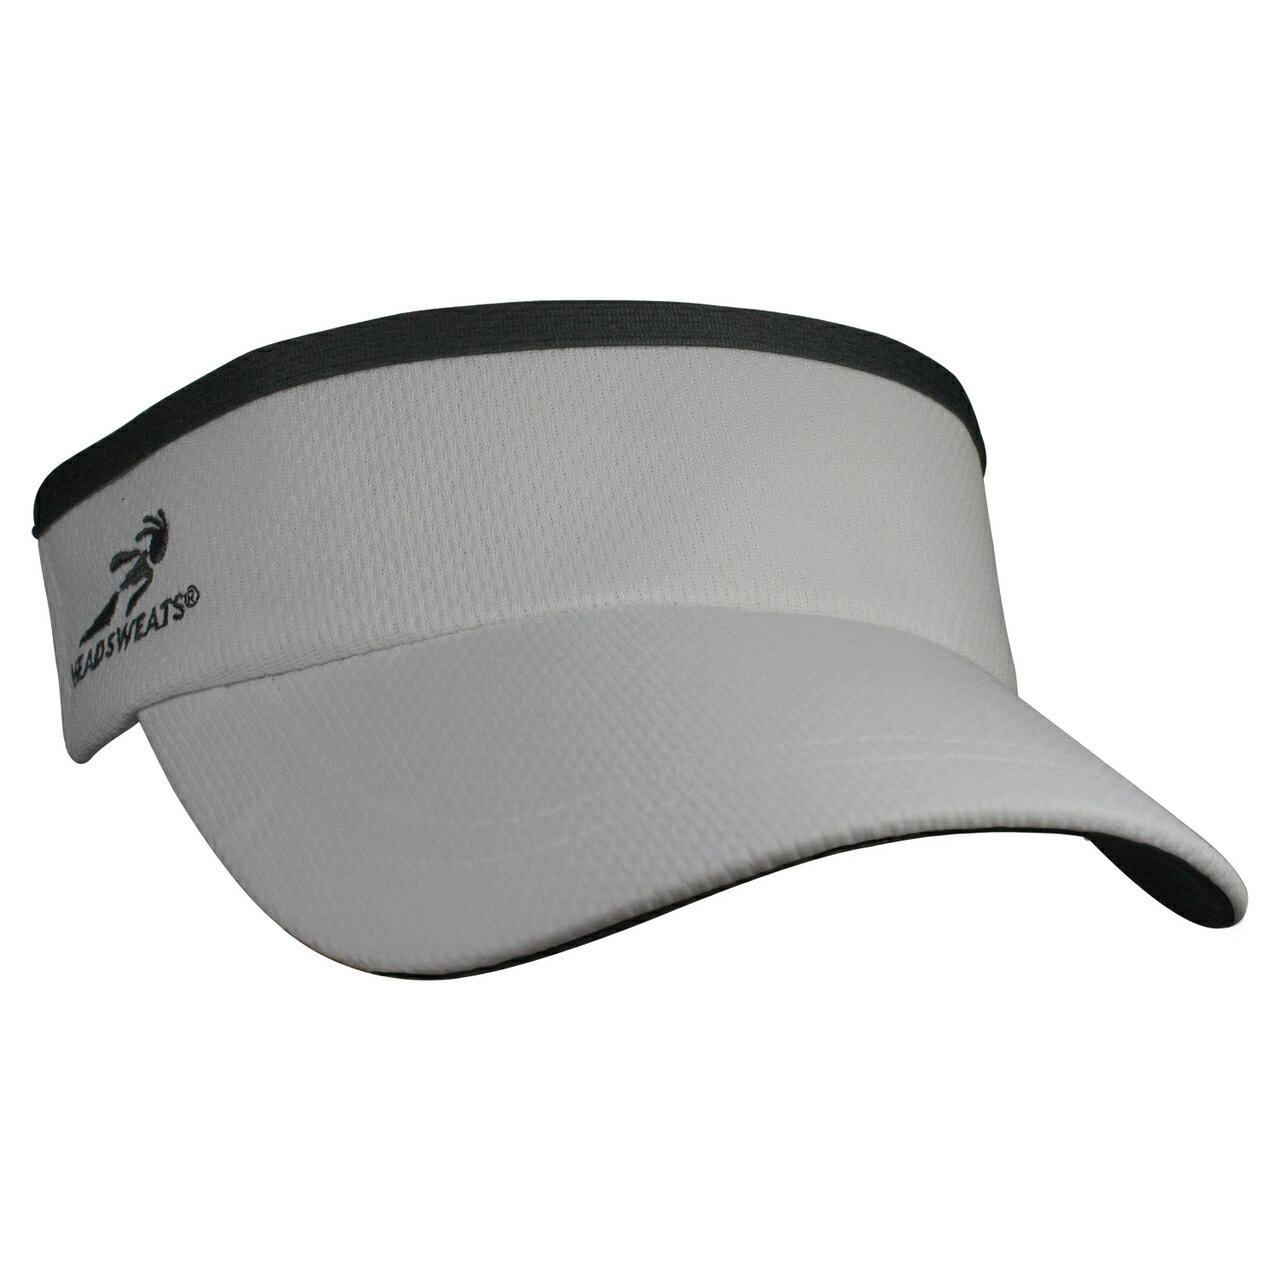 HEADSWEATS 汗淂 Supervisor 遮陽帽 (灰色)